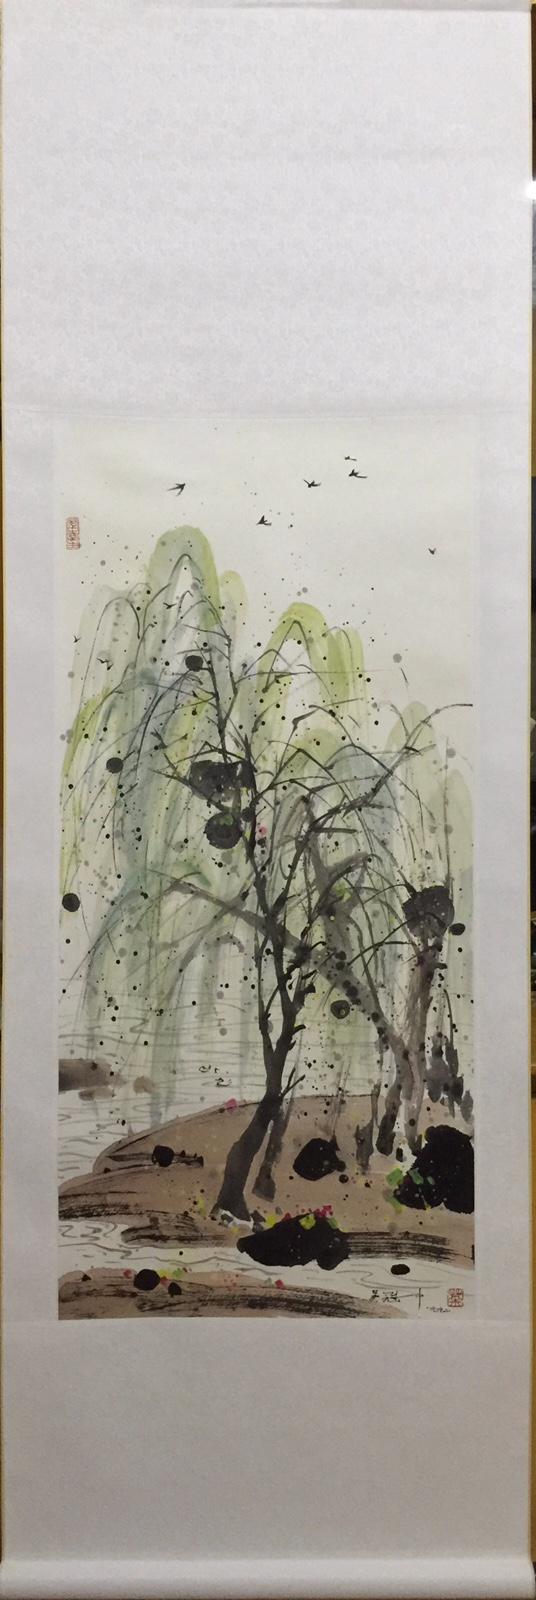 Wu Guanzhong (1919-2010), Landscape